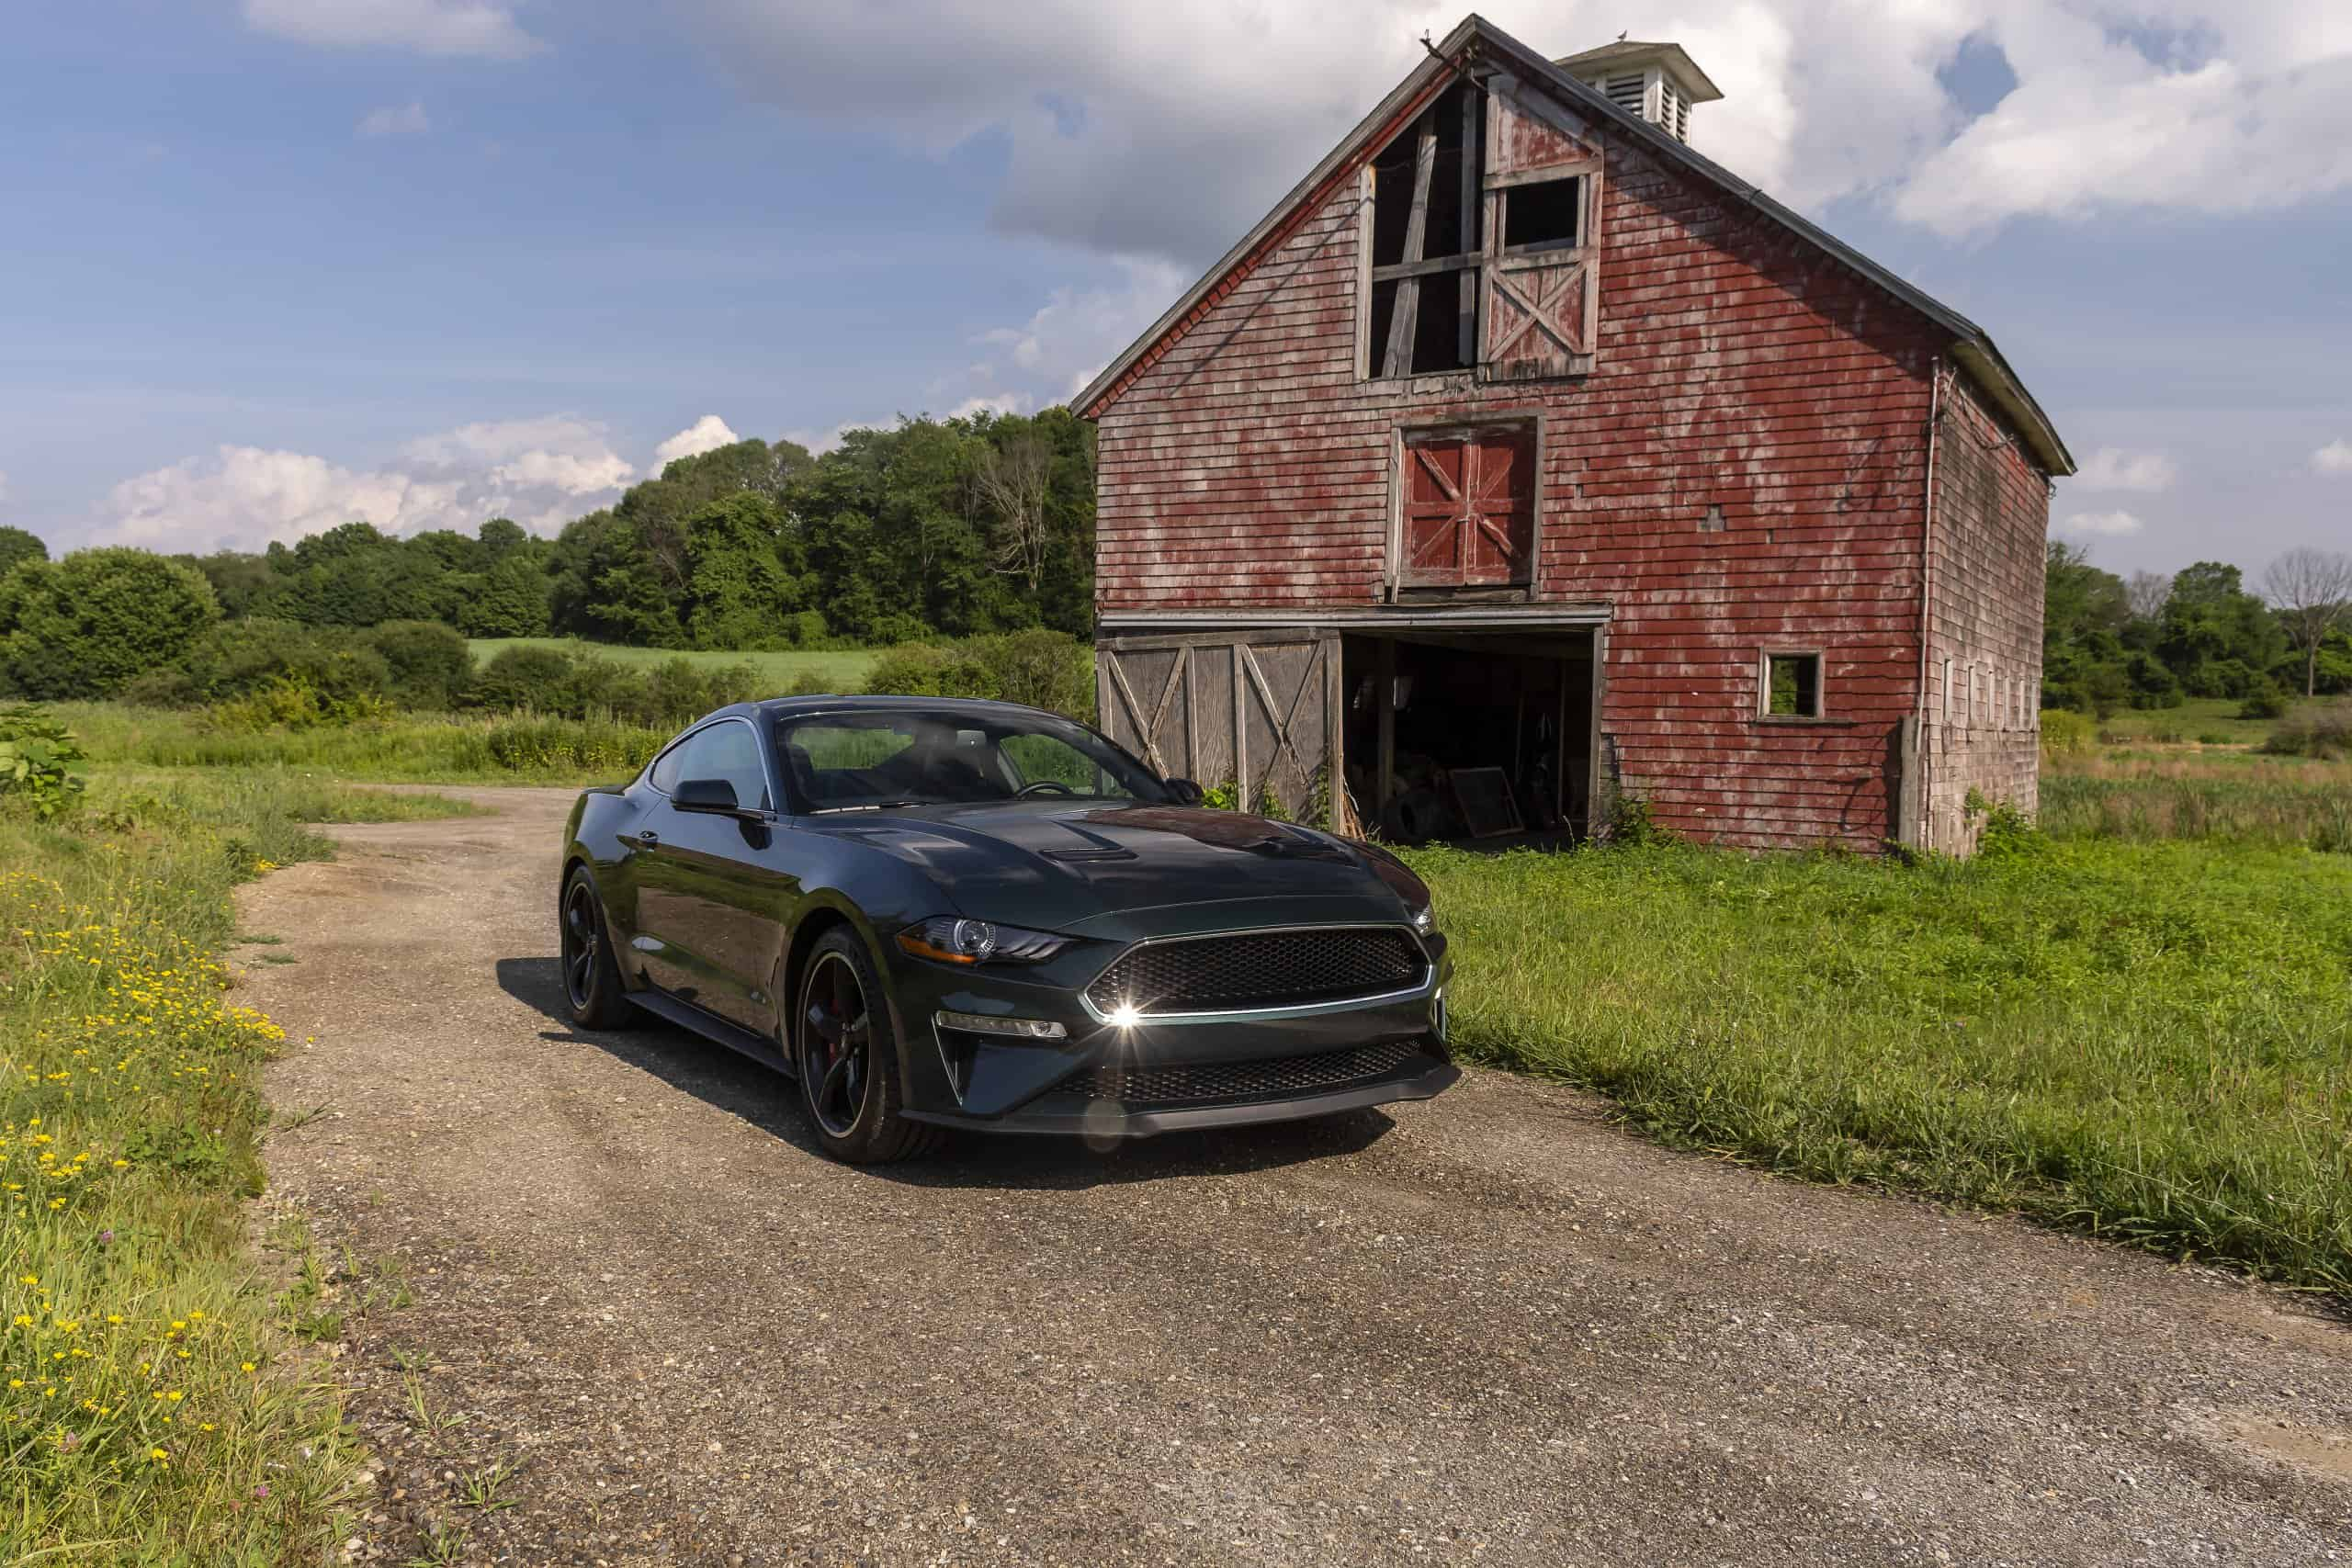 2020 Mustang Bullitt Edition is cool